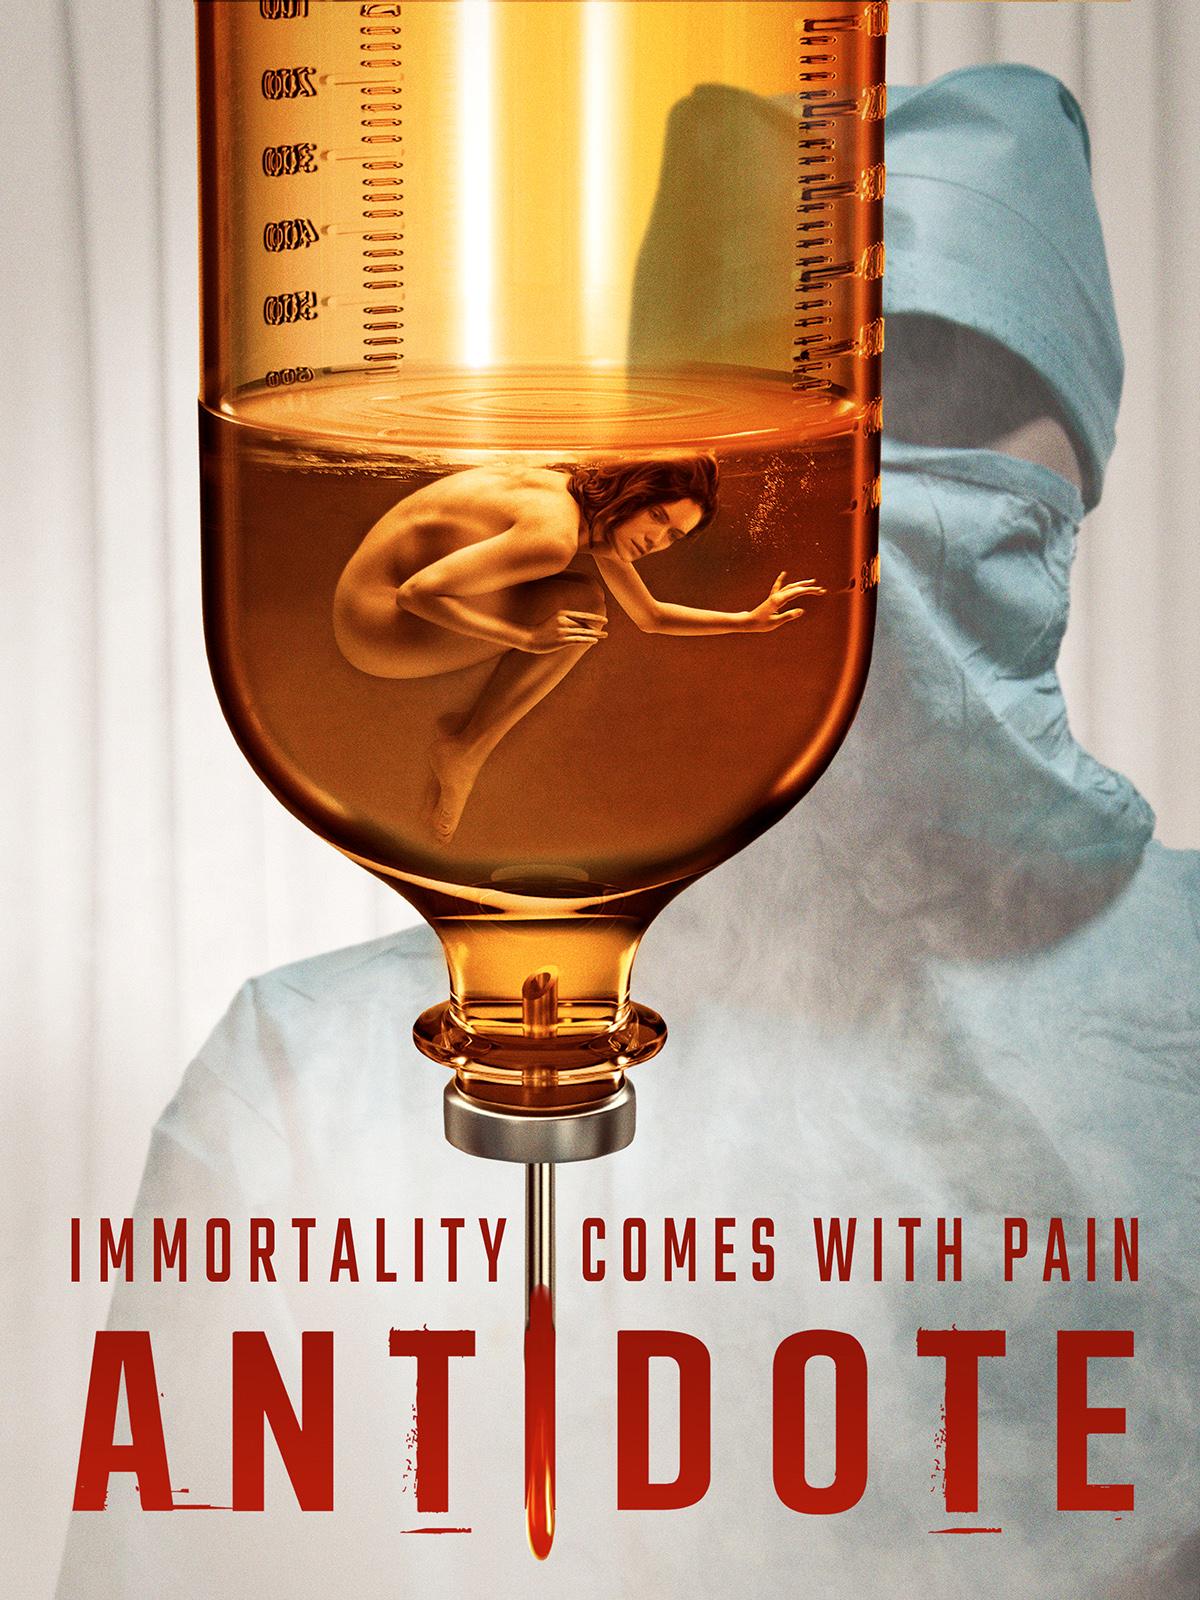 The Antidote Trailer